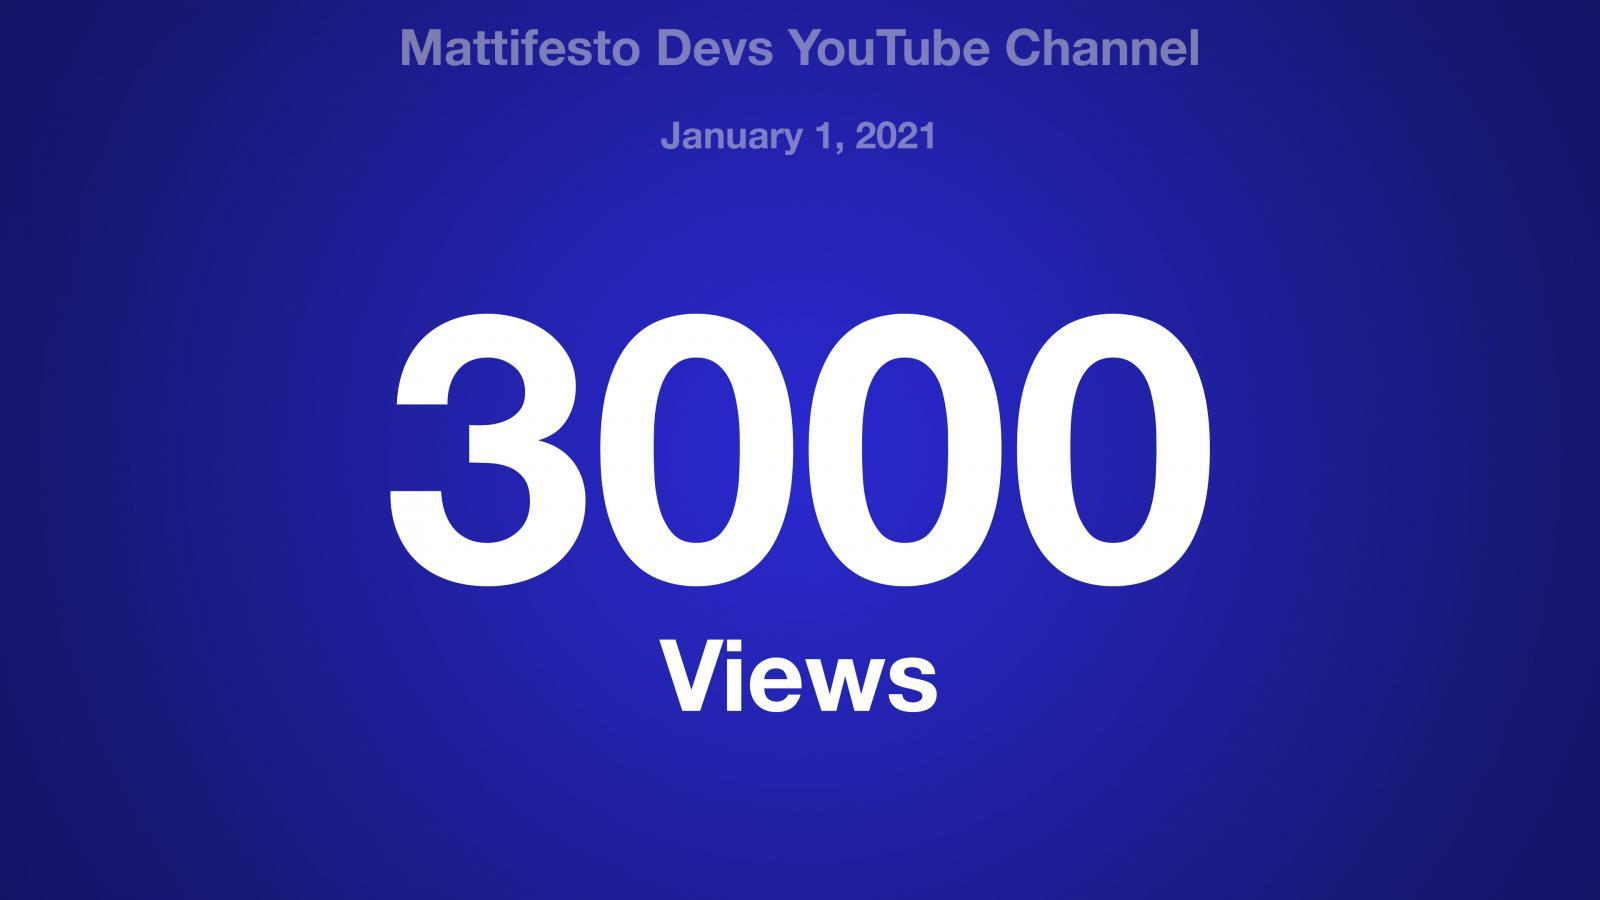 Mattifesto Devs YouTube Channel, January 1, 2021, 3000 Views